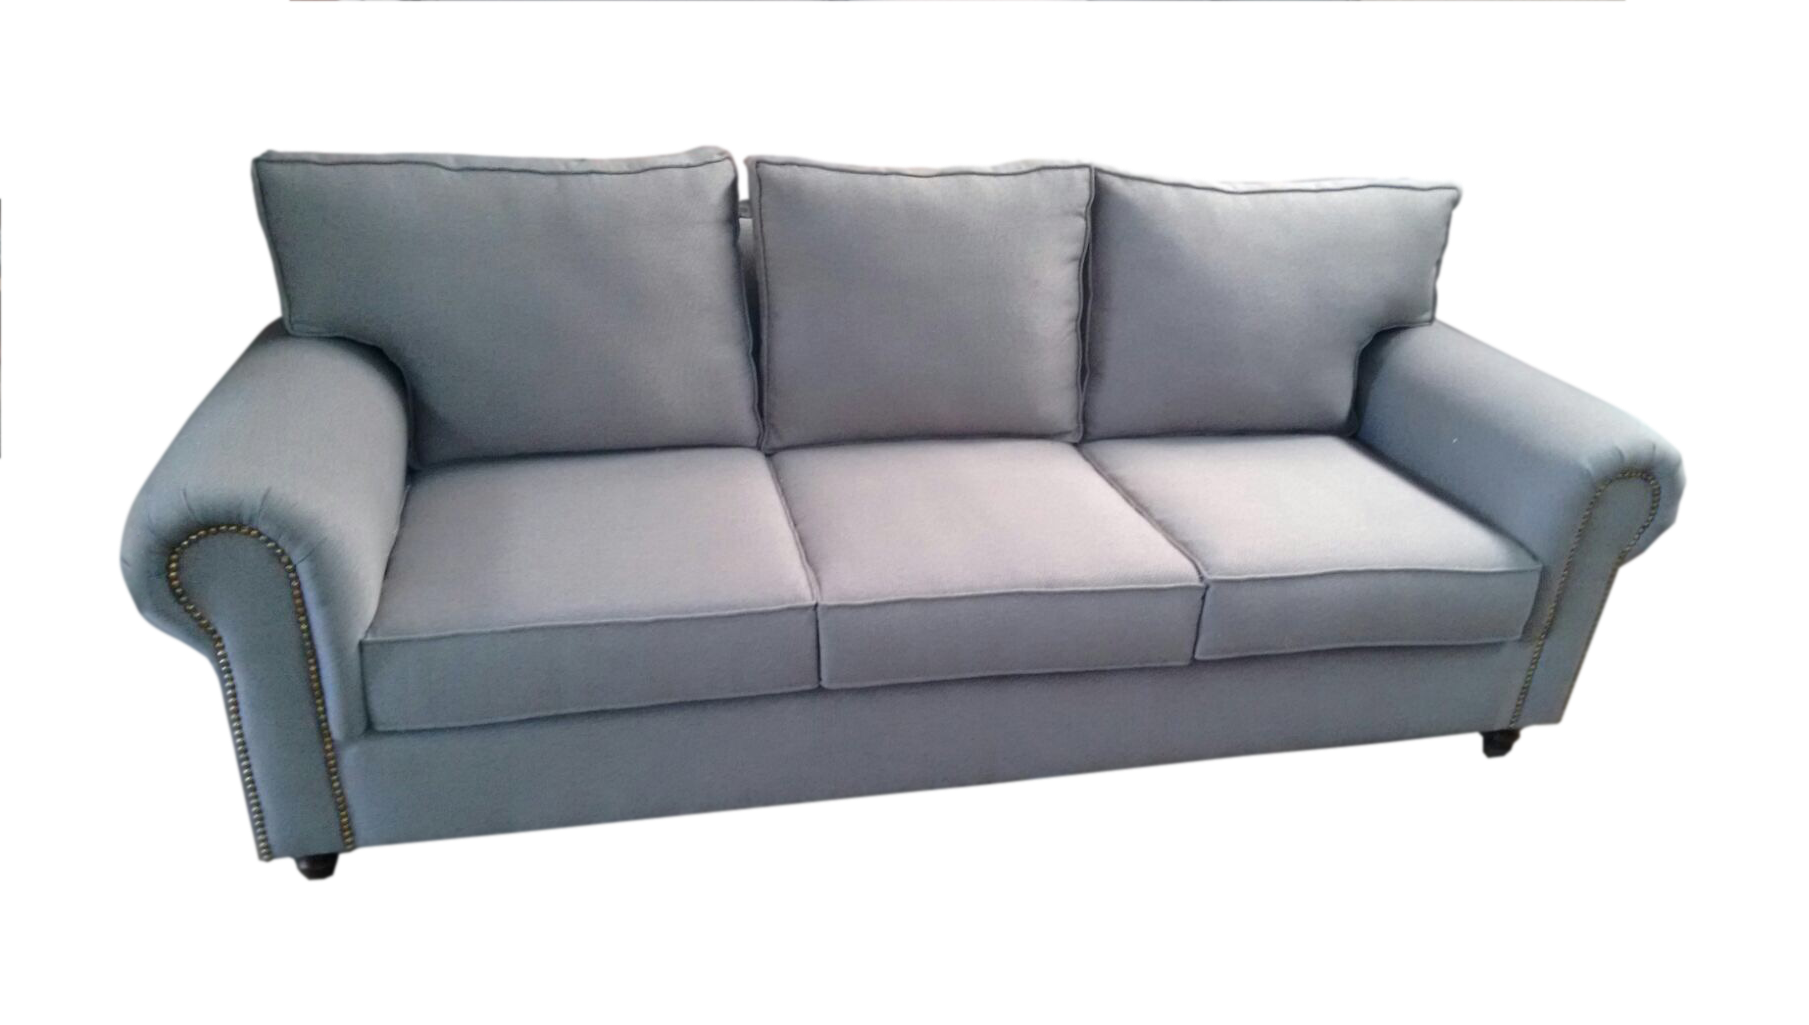 sof y taburete fara makali hogar m xico df. Black Bedroom Furniture Sets. Home Design Ideas